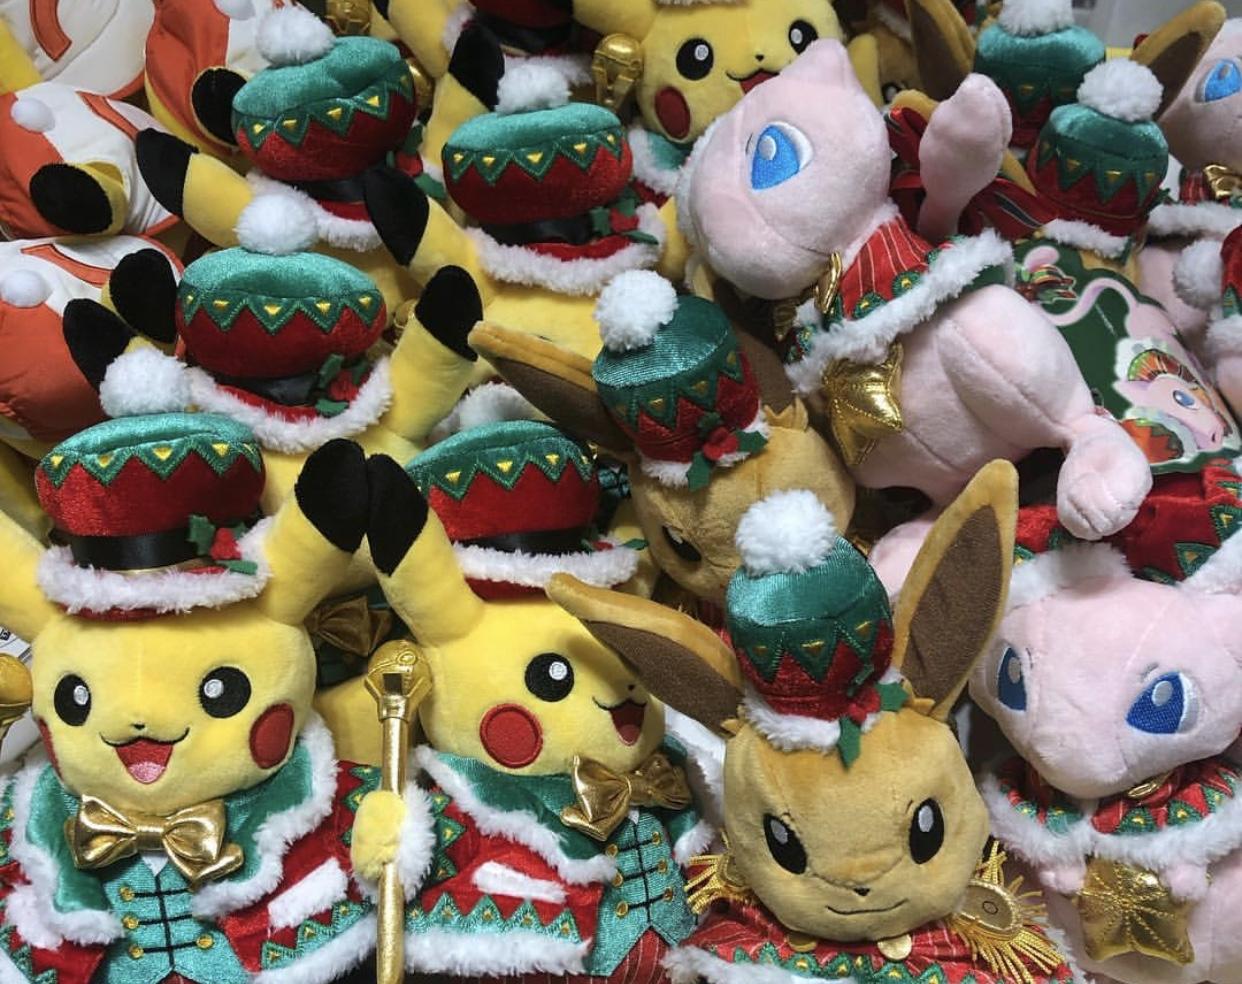 Top 5 Websites For Anime Merchandise